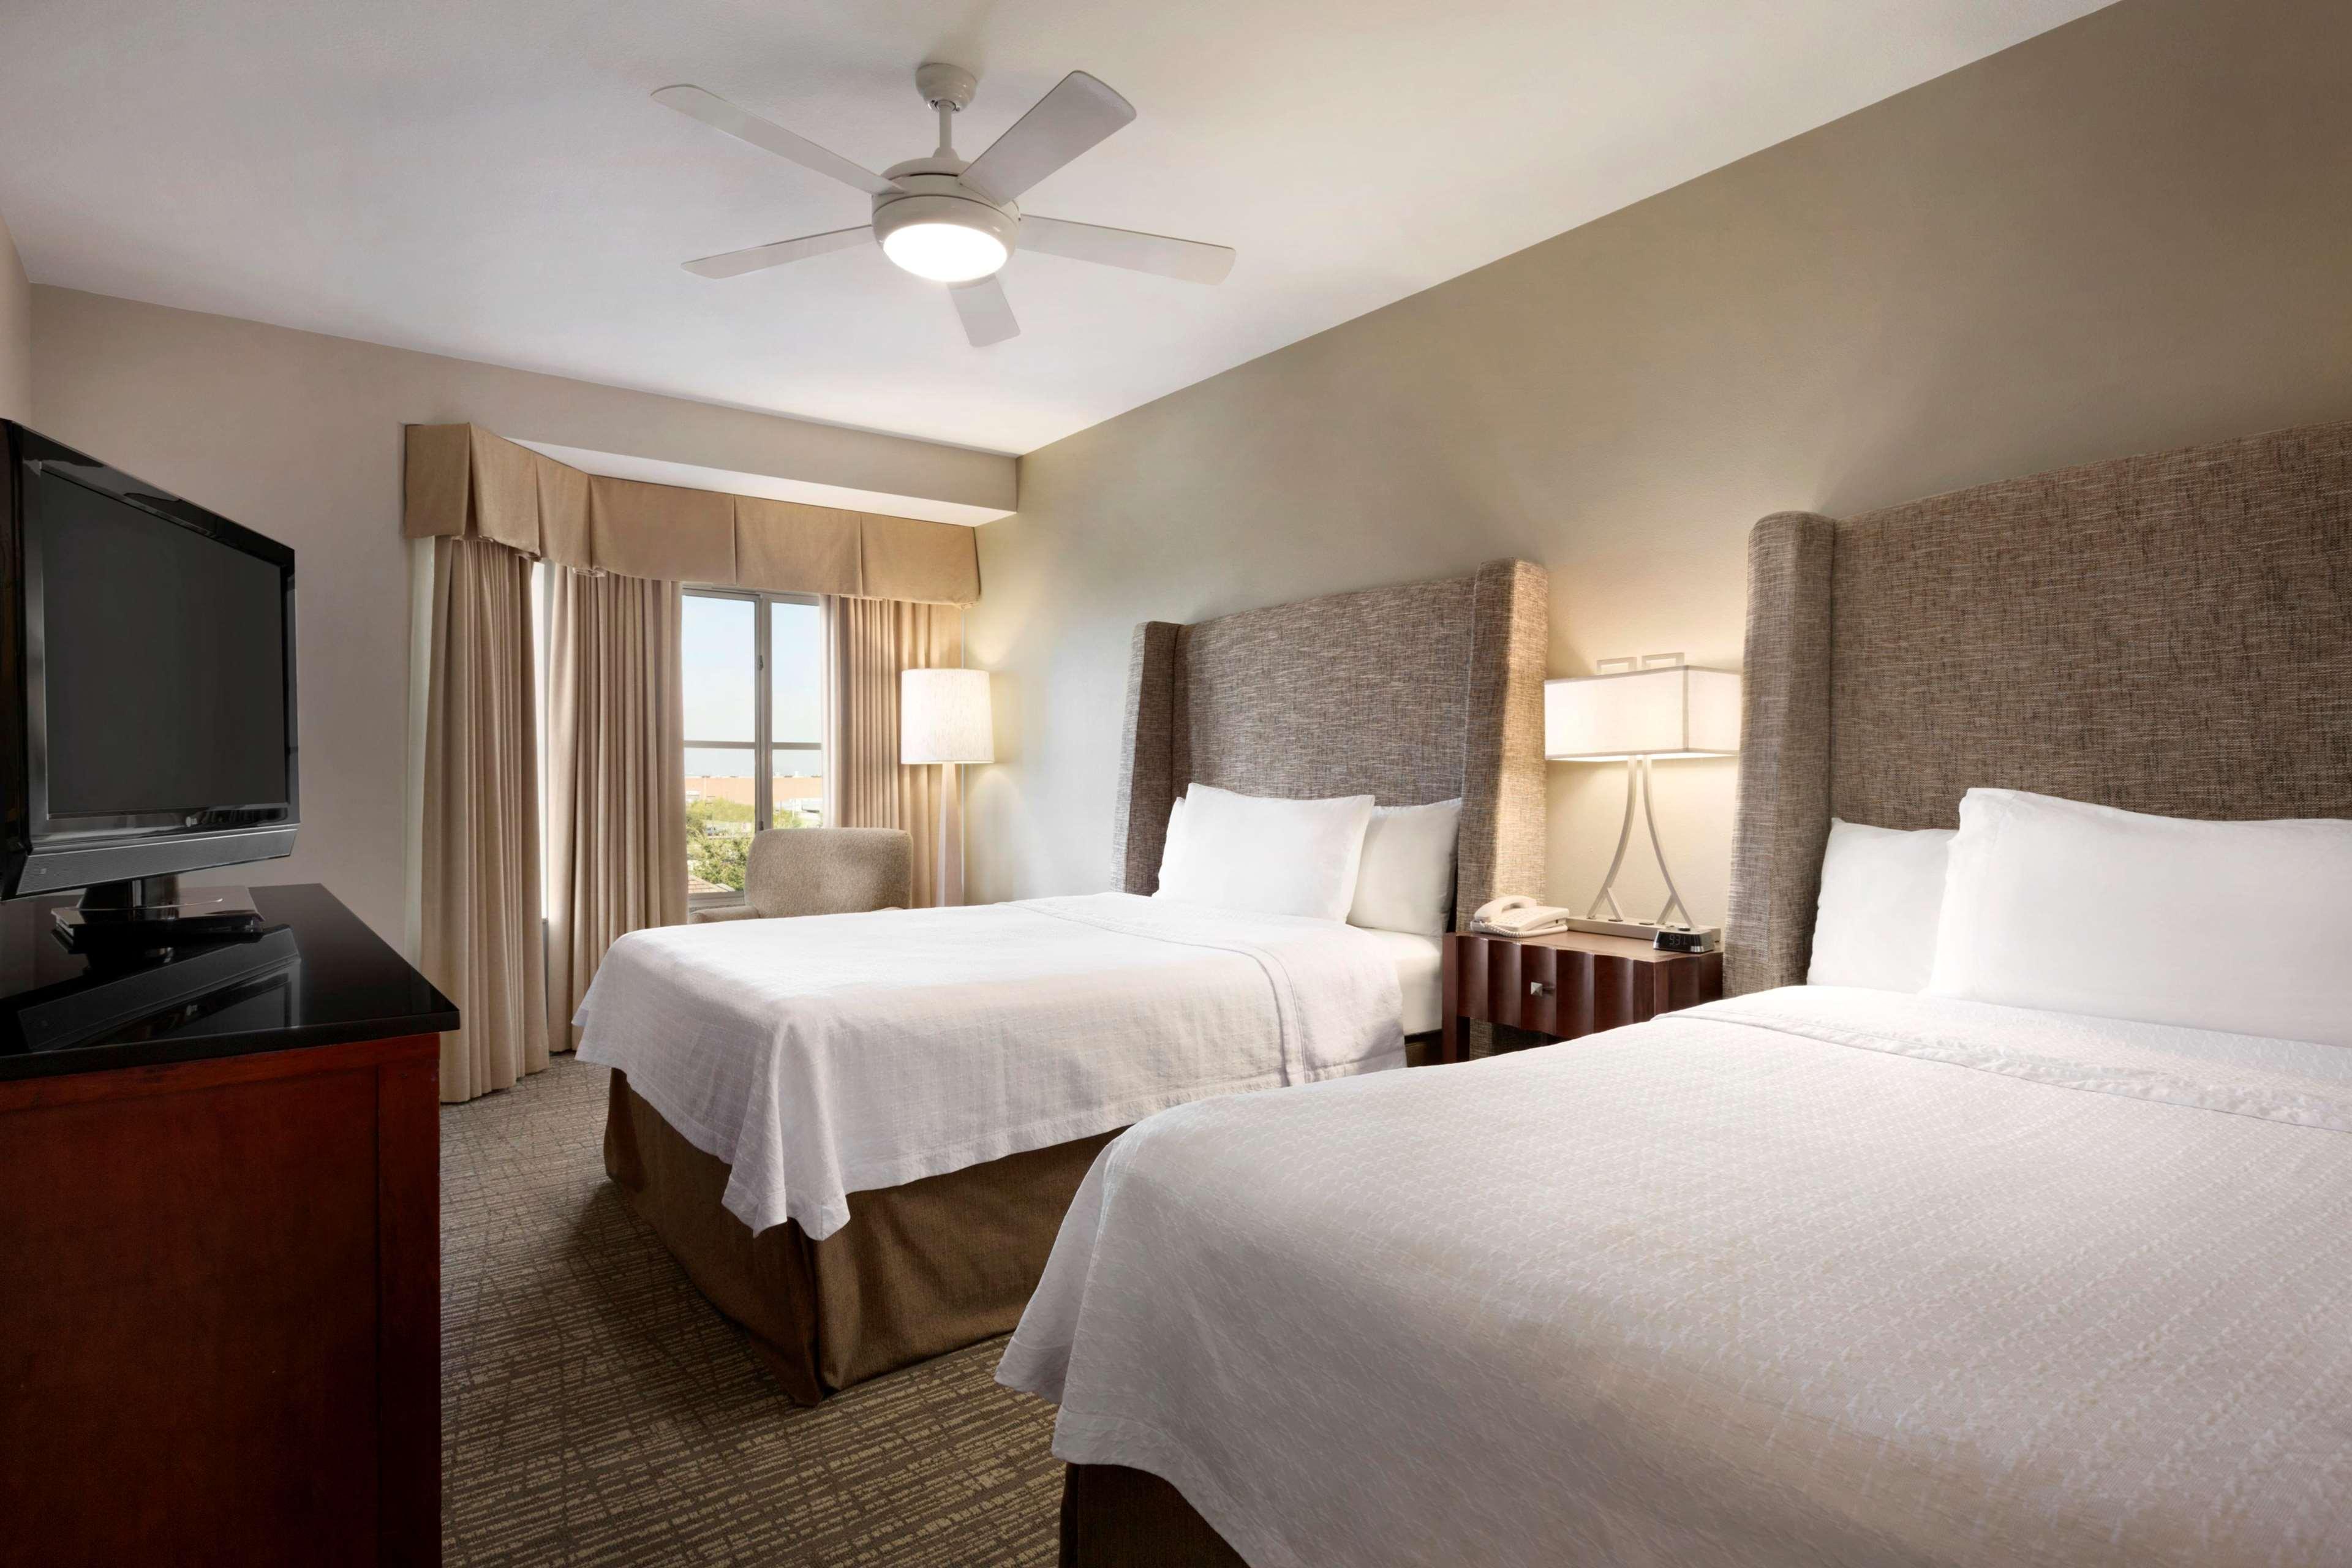 Homewood Suites by Hilton Plano-Richardson image 24